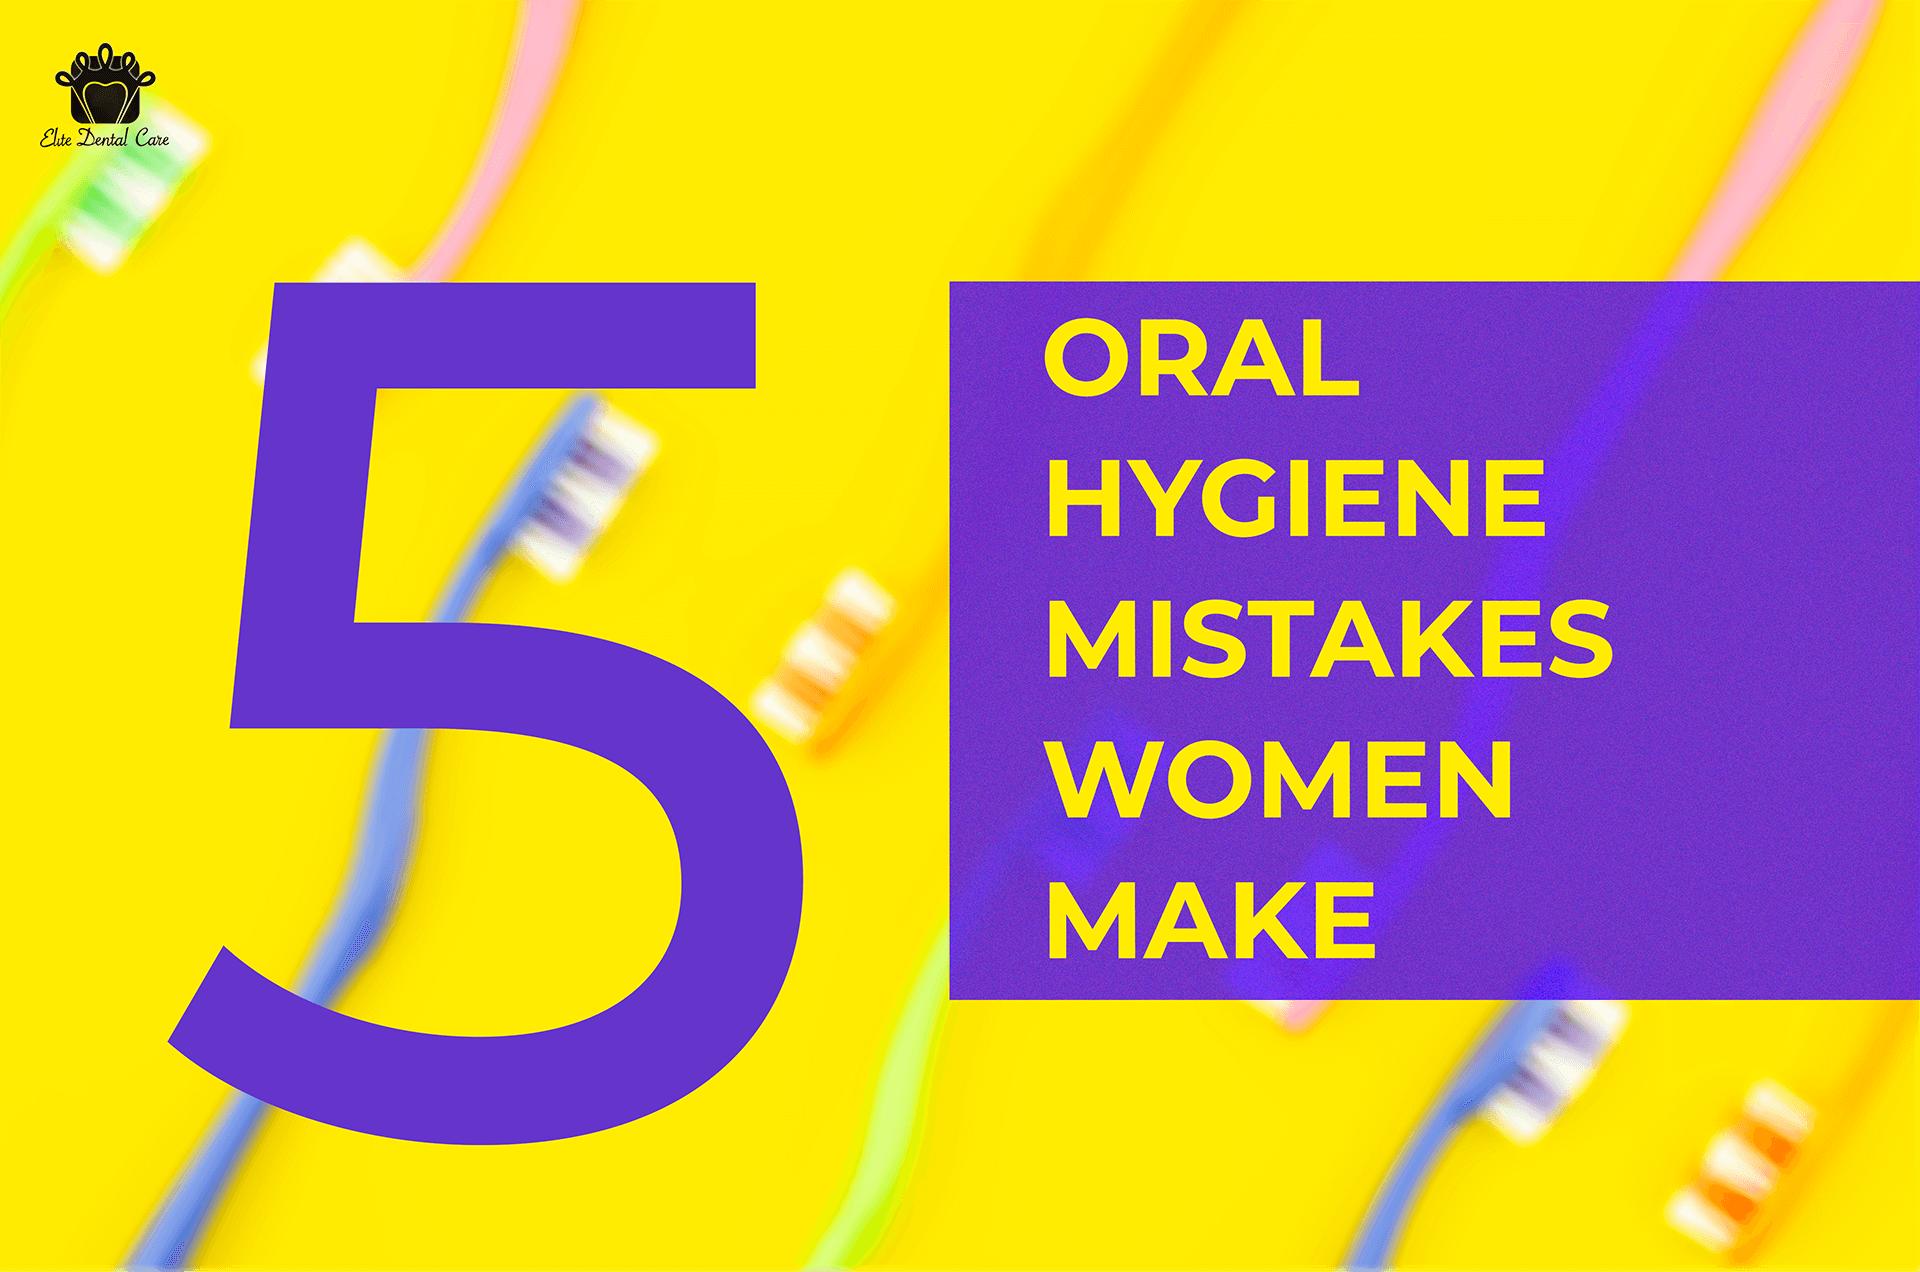 Five Oral Hygiene Mistakes Women Make